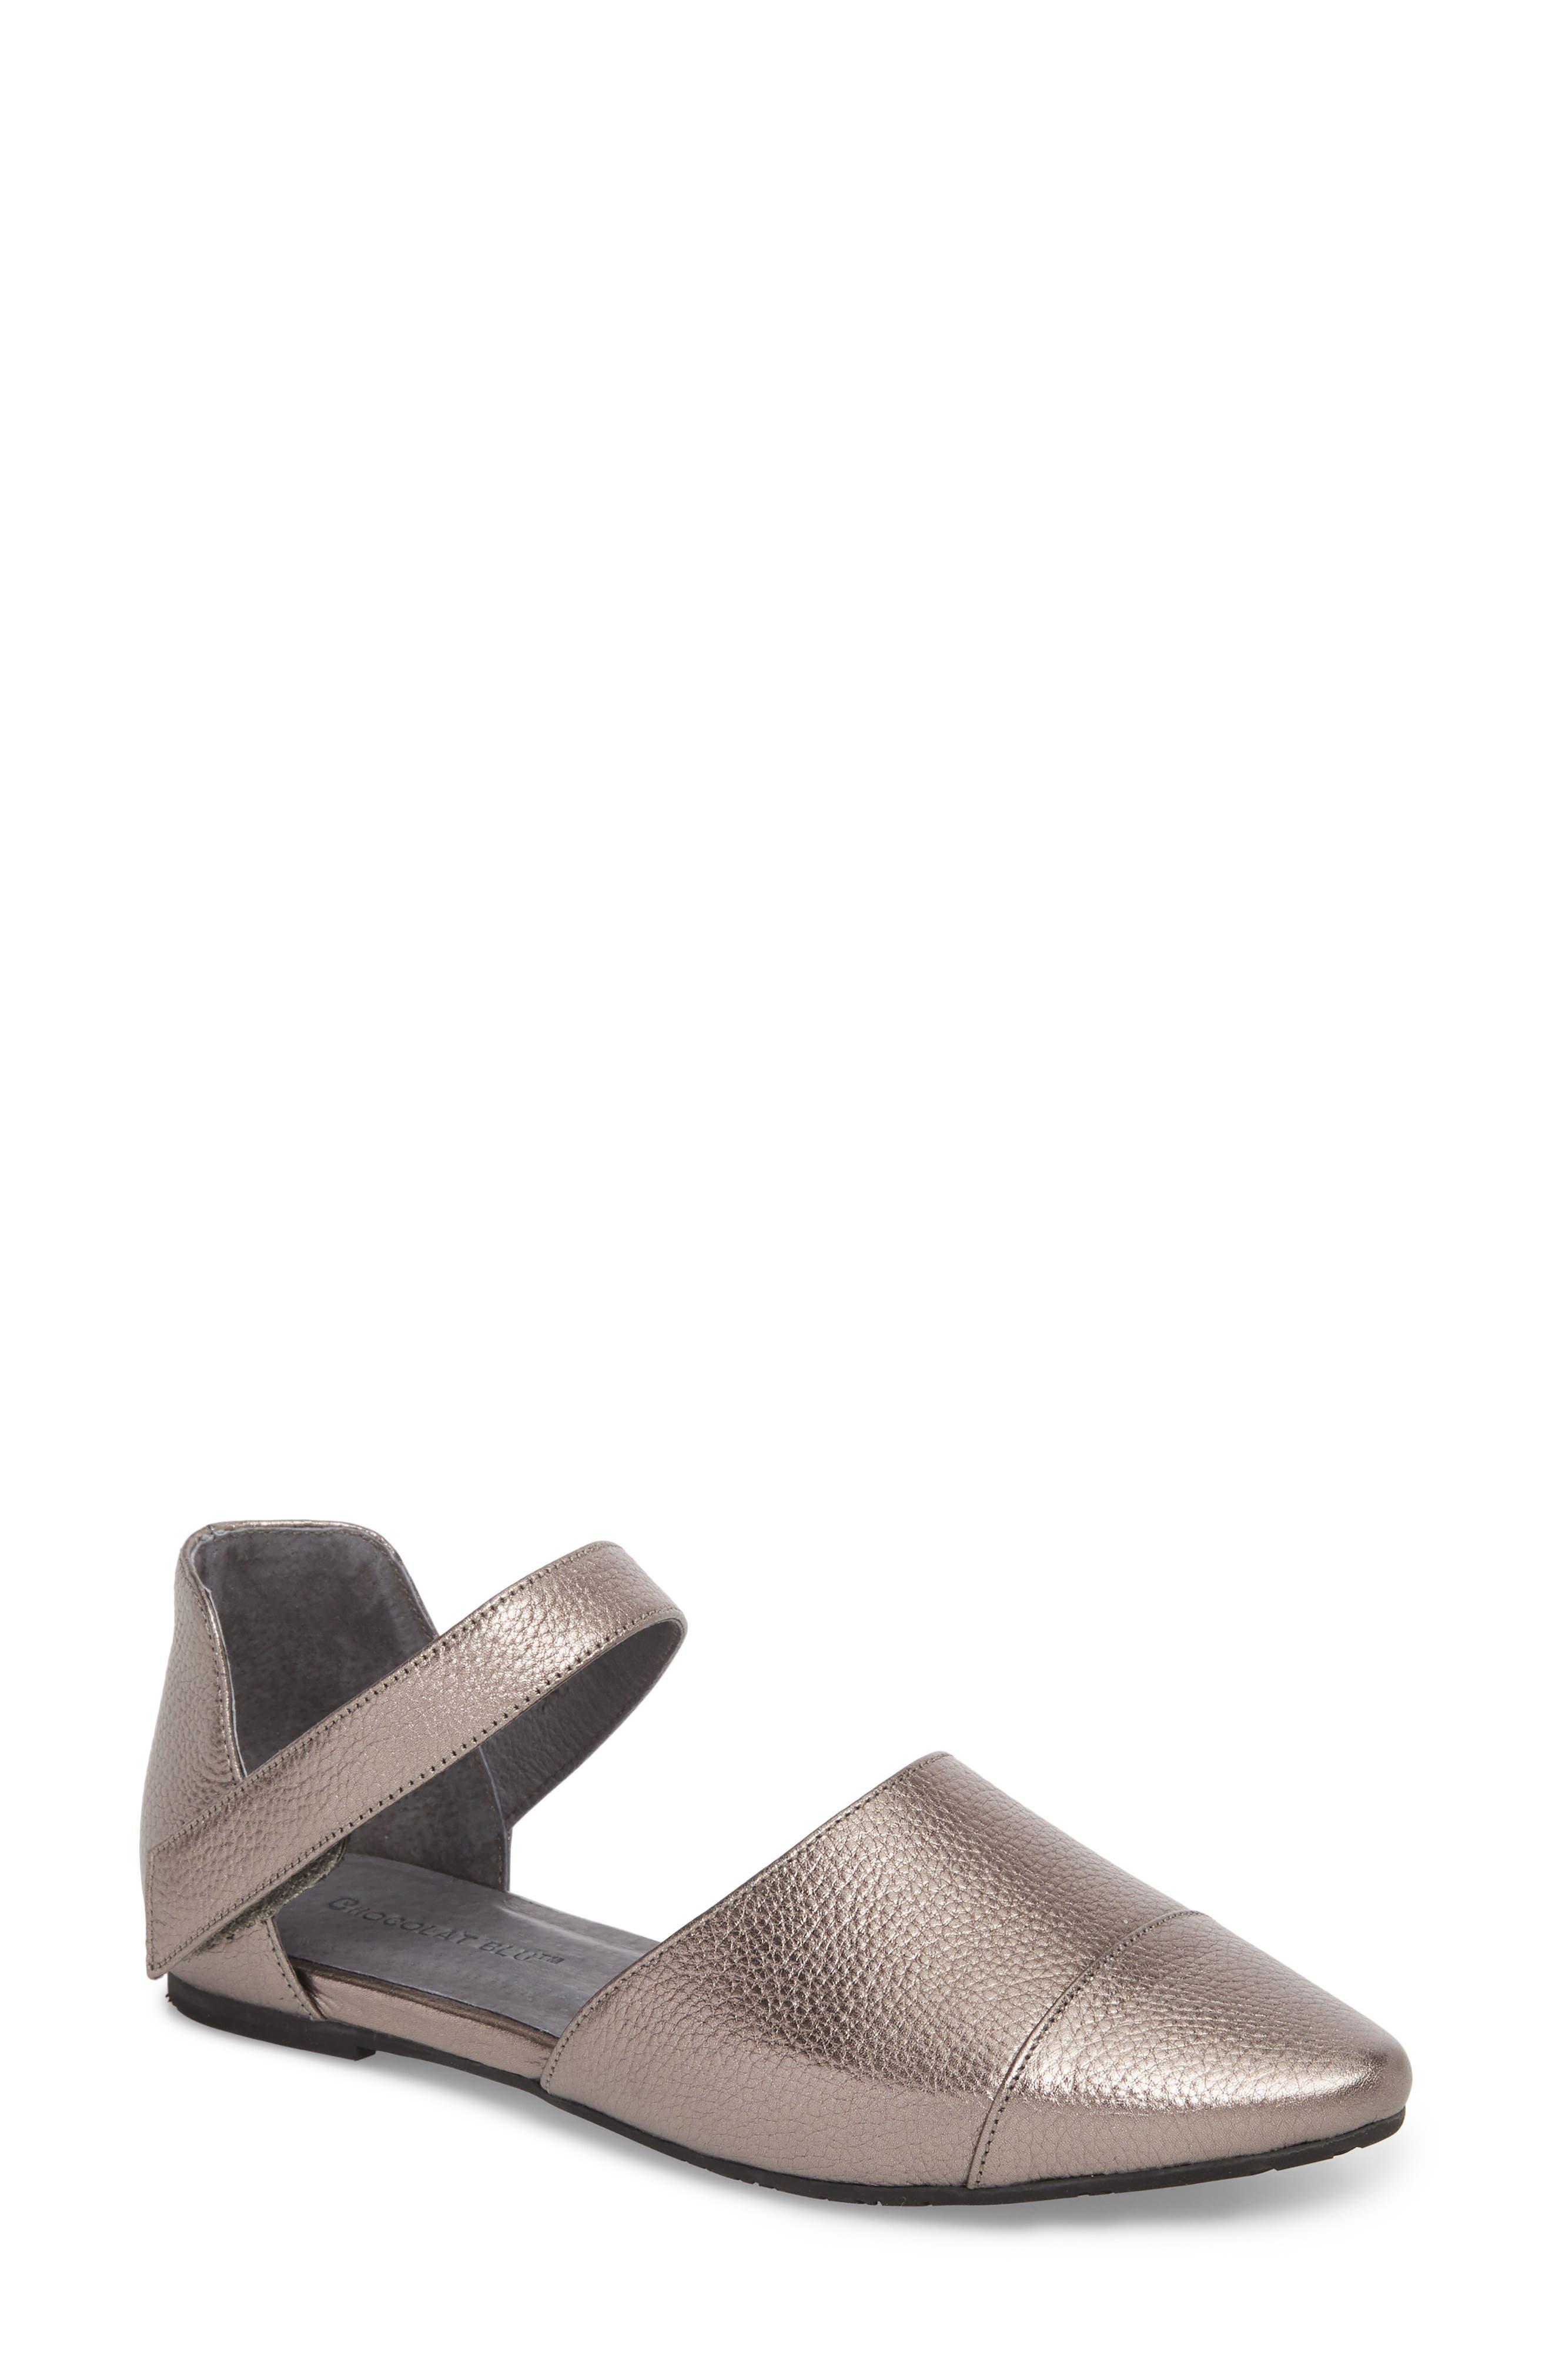 Gaia Pointy Toe Flat,                         Main,                         color, Gunmetal Leather